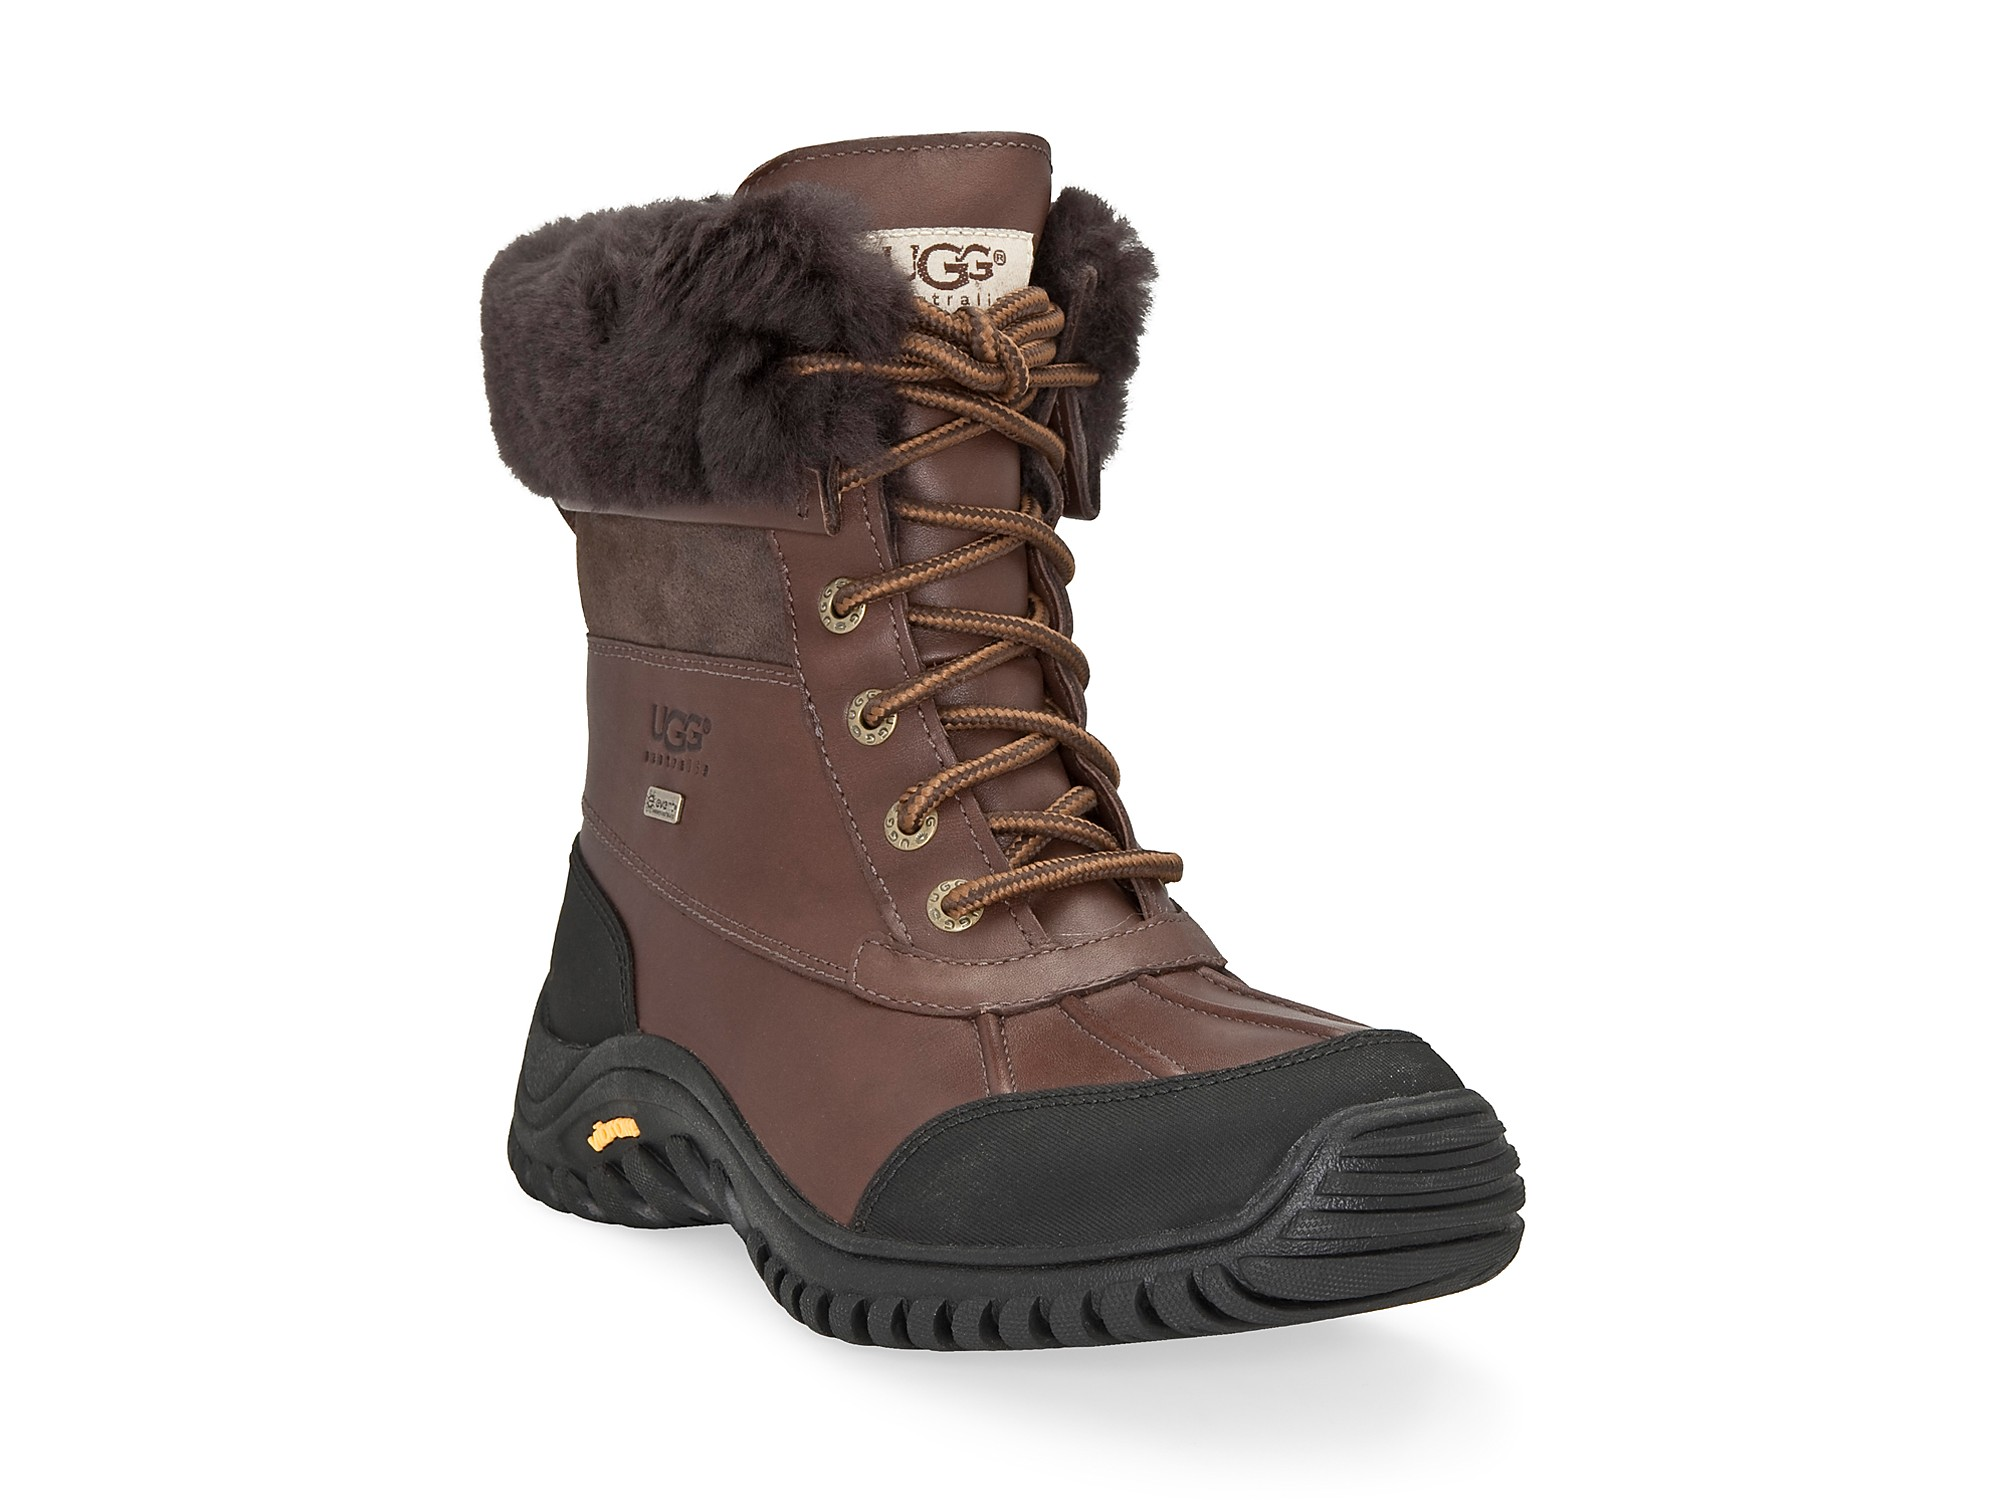 Innovative UGG Australia Womenu0026#39;s Black/ Grey U0026#39;Adirondacku0026#39; Snow Boots (Size 6) - Overstock Shopping - Great ...